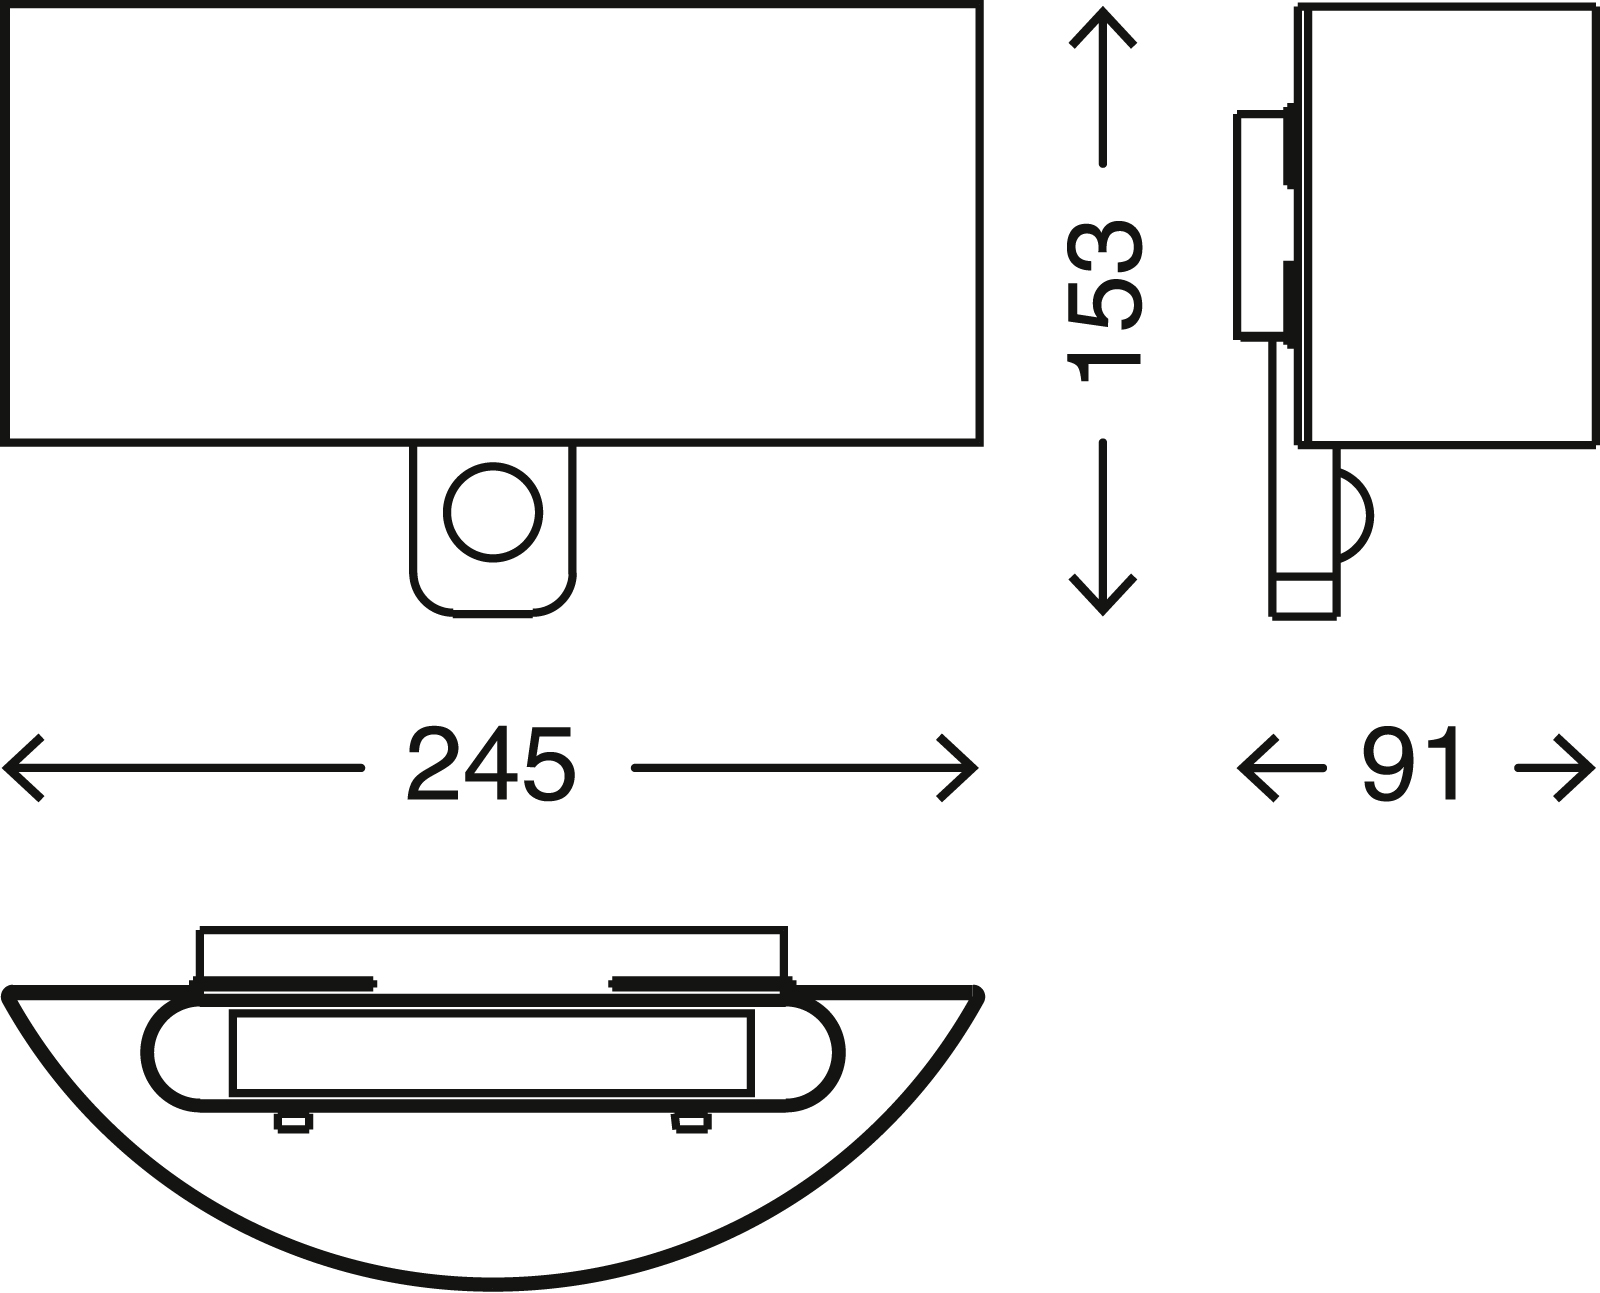 TELEFUNKEN Sensor LED Aussenleuchte, 24,5 cm, 8,5 W, Silber